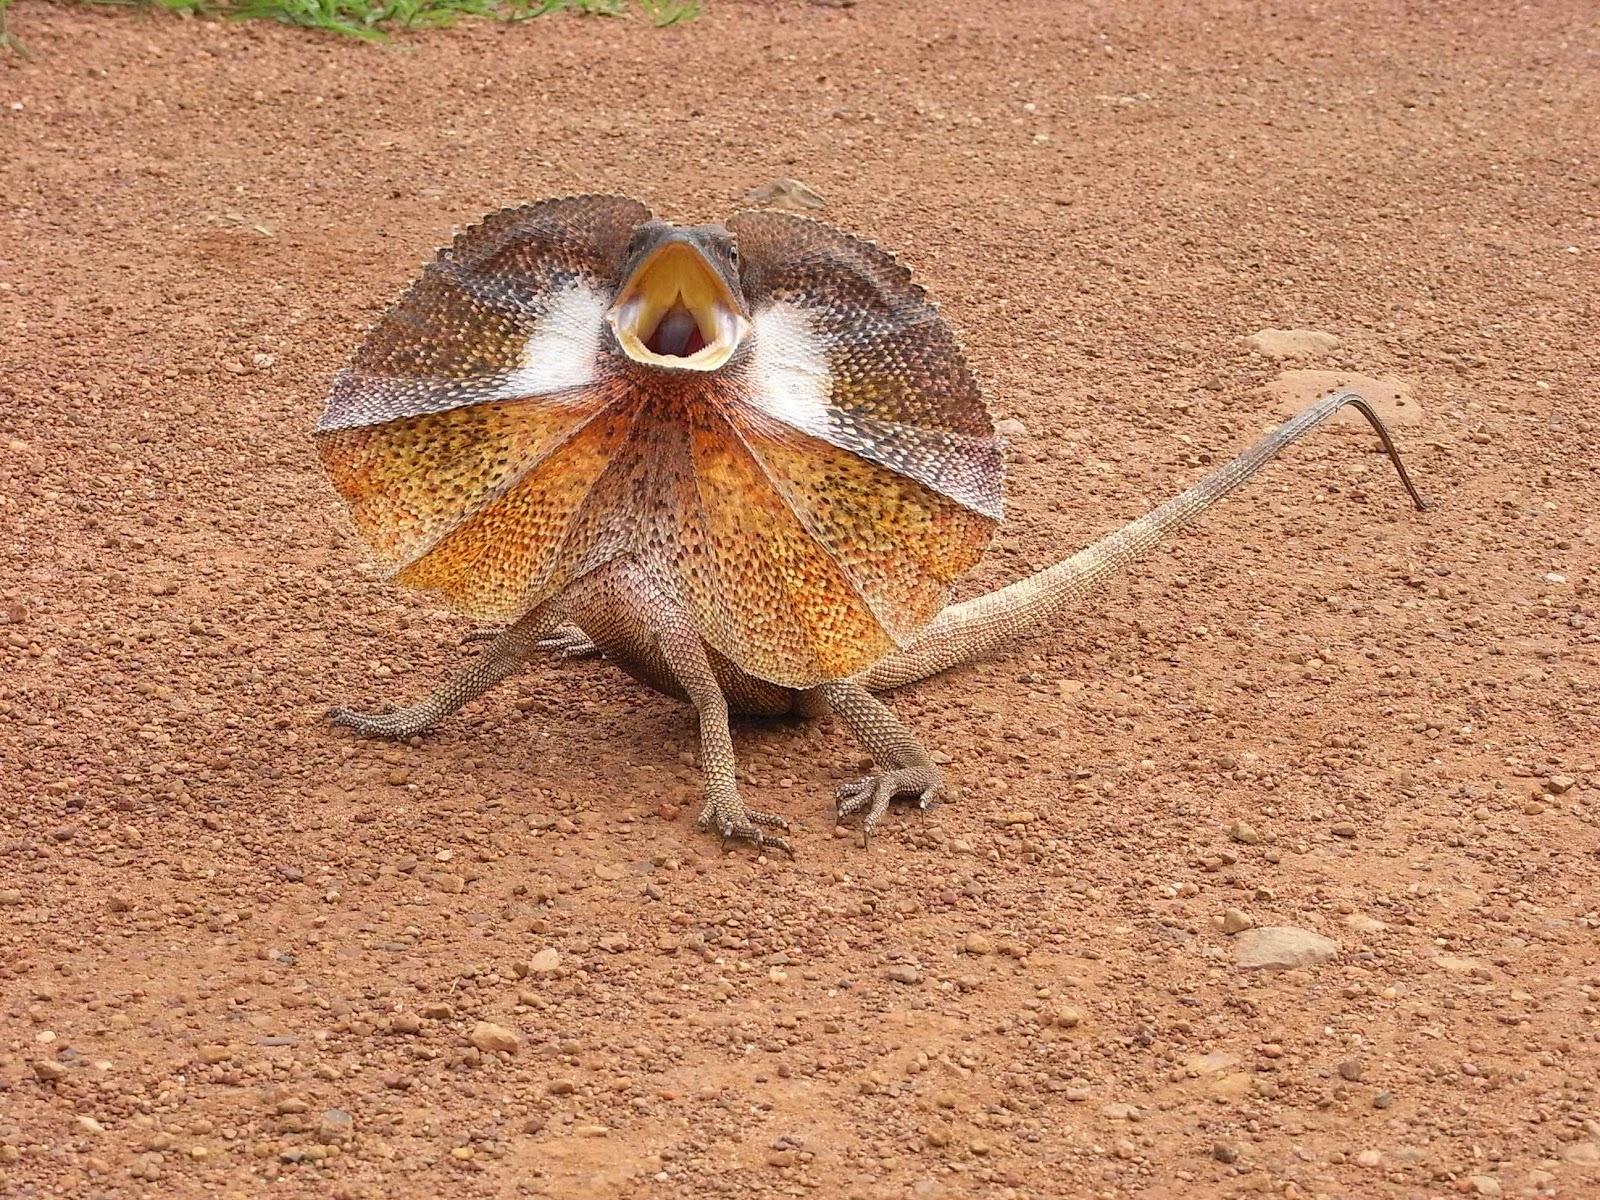 Frill Necked Lizard | Interesting & Funny Pics